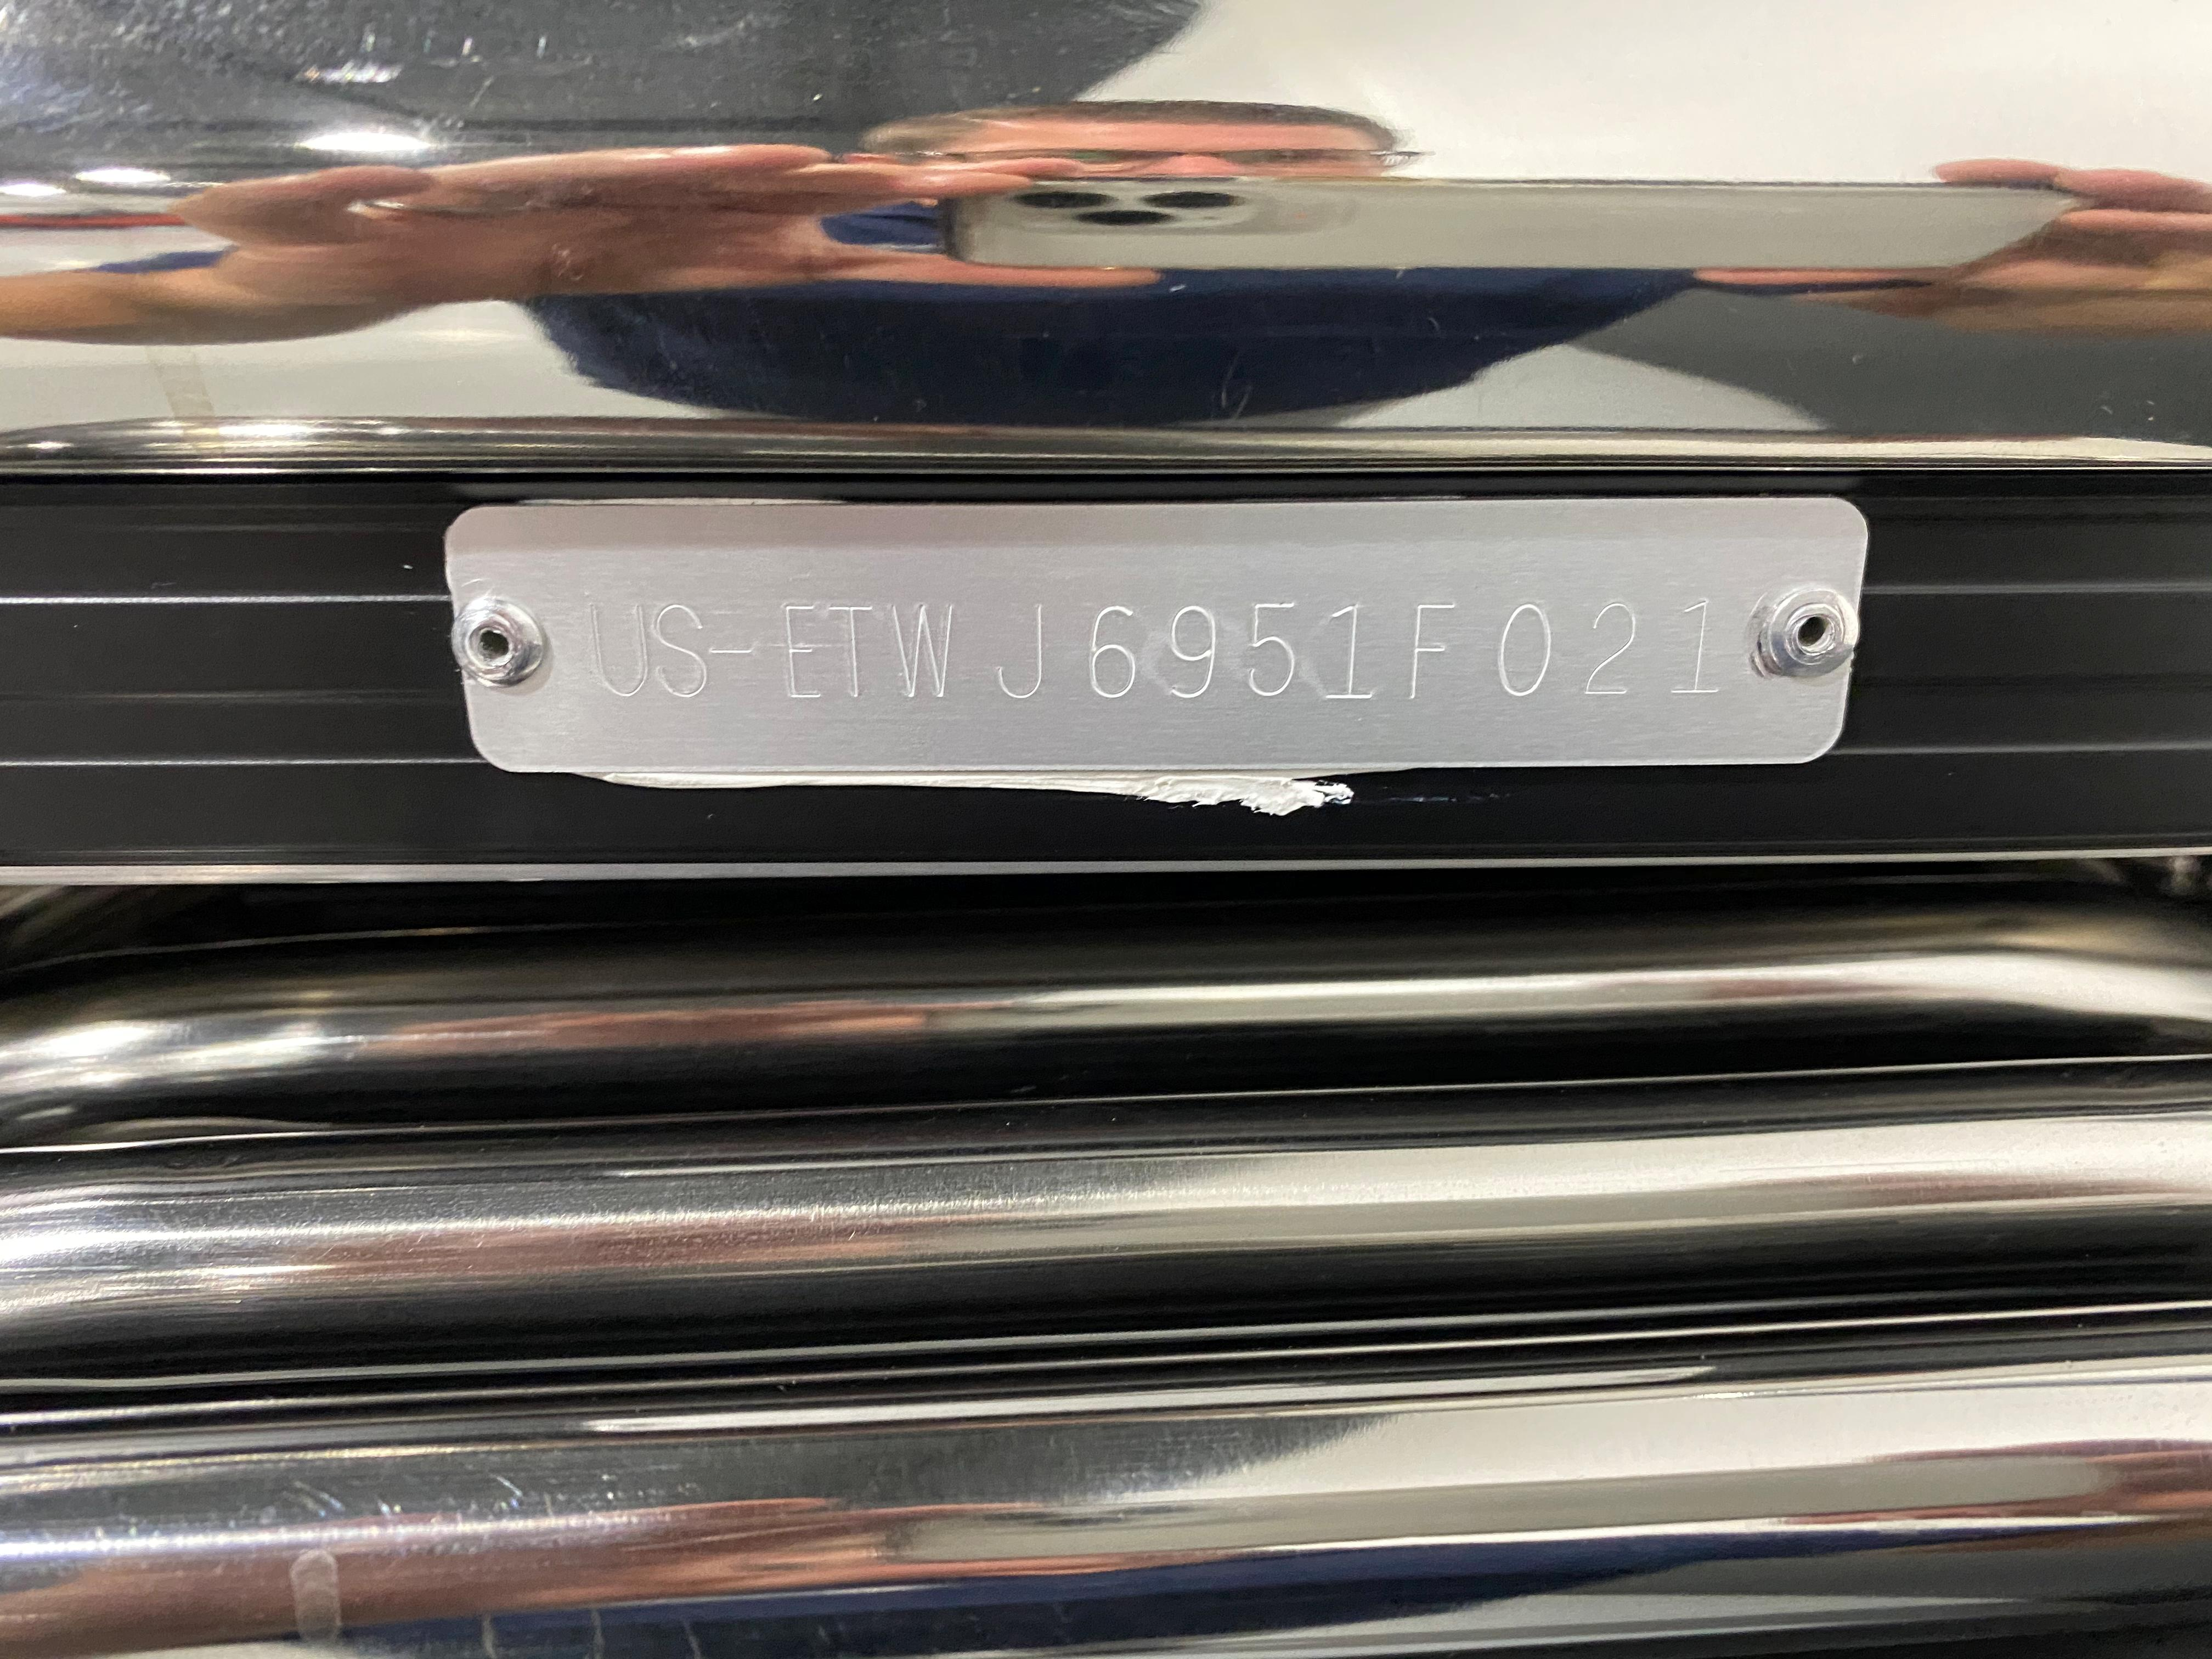 2021 Bennington 25 QSB #B6951F inventory image at Sun Country Inland in Lake Havasu City